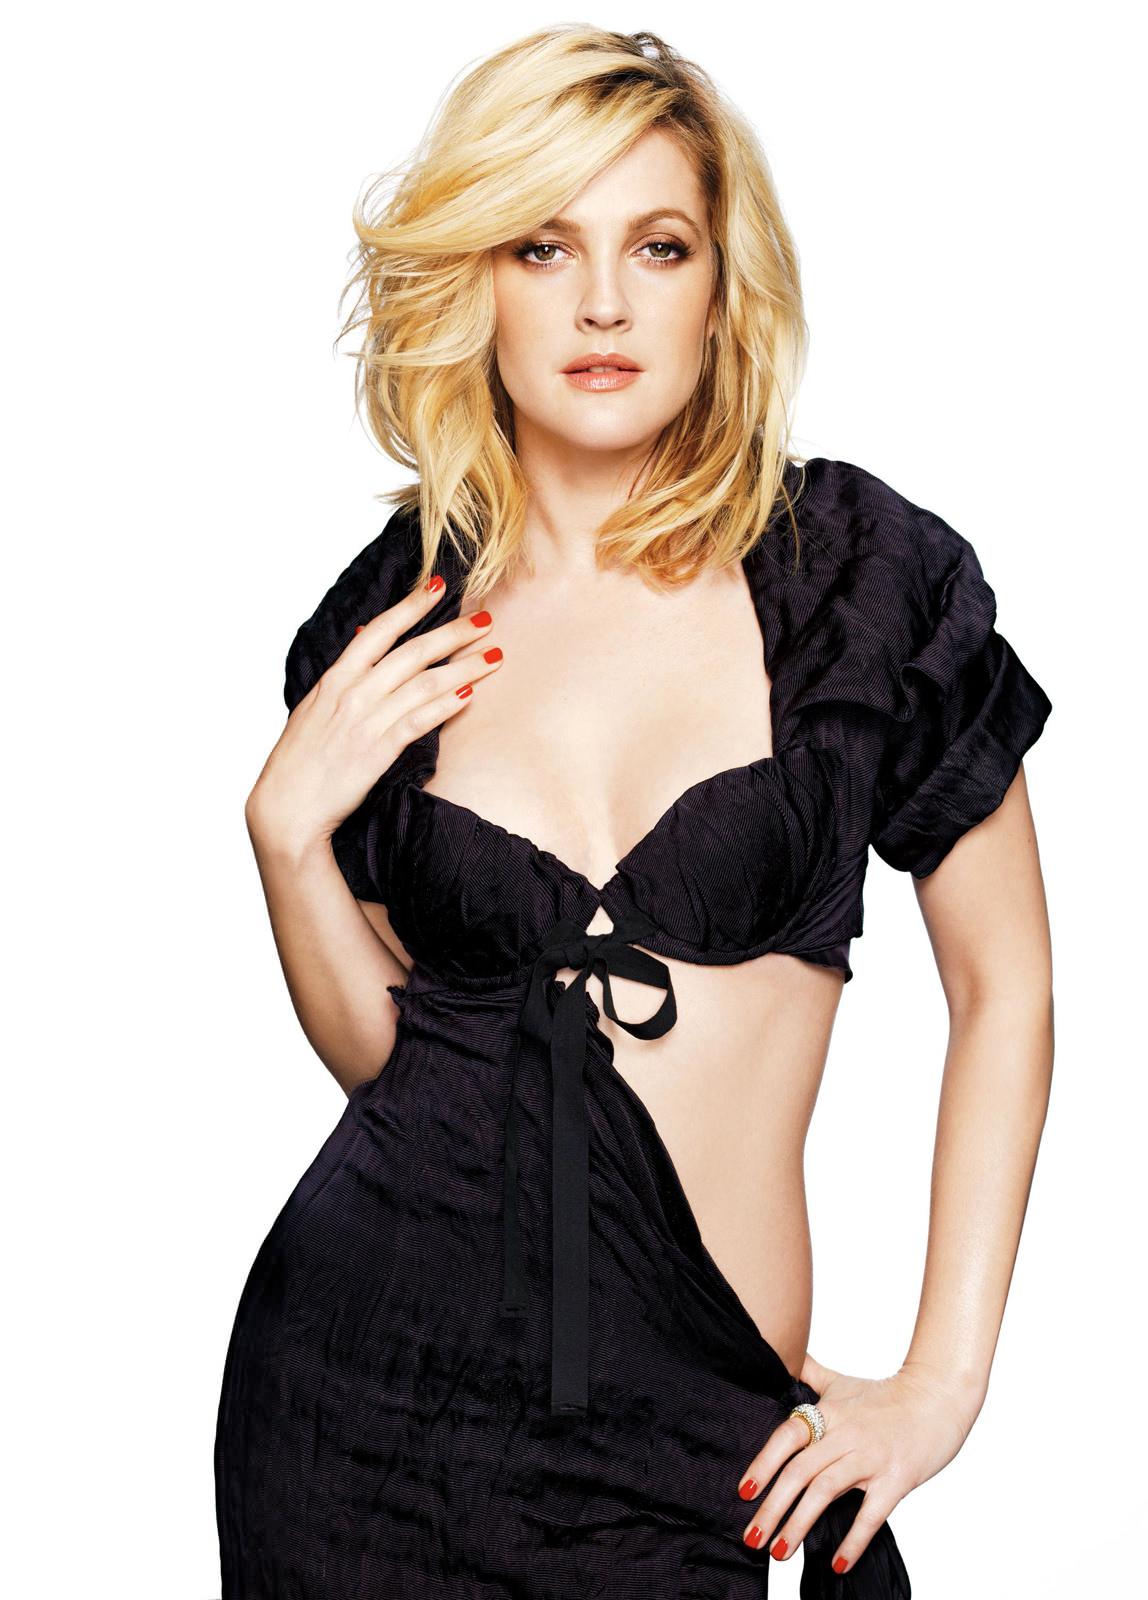 Drew Barrymore Photo Gallery